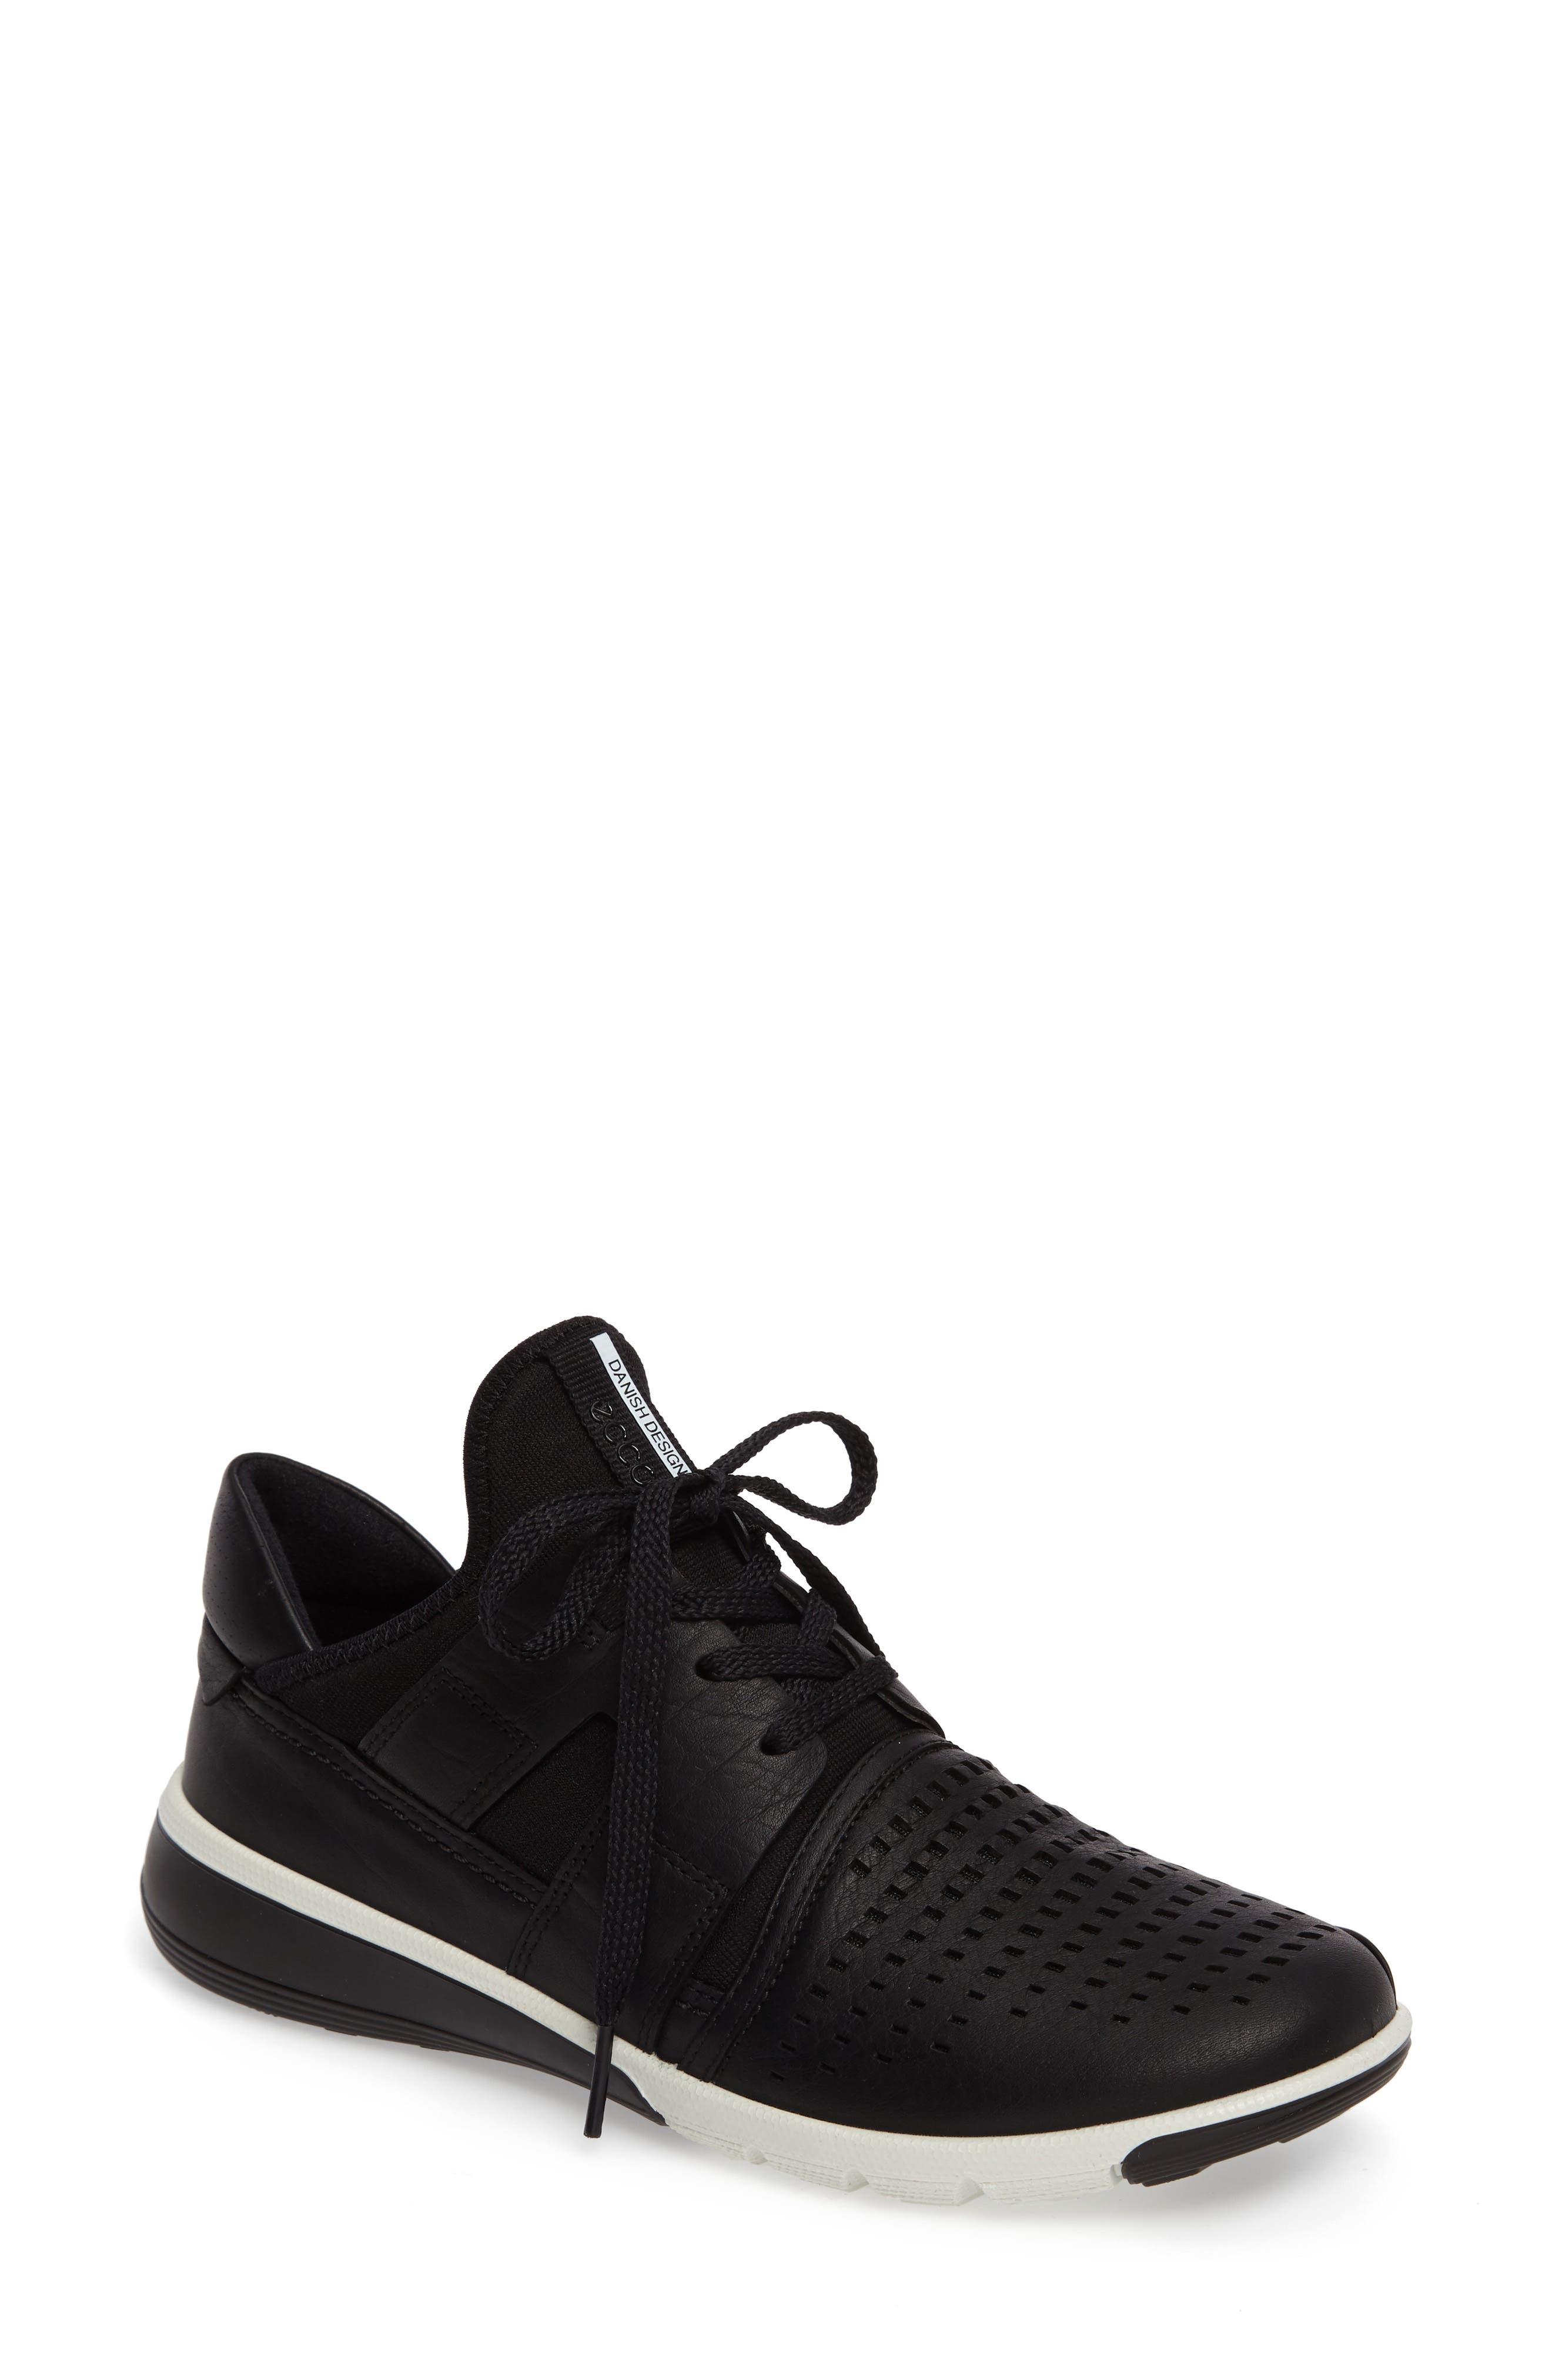 Main Image - ECCO Intrinsic 2 Sneaker (Women)